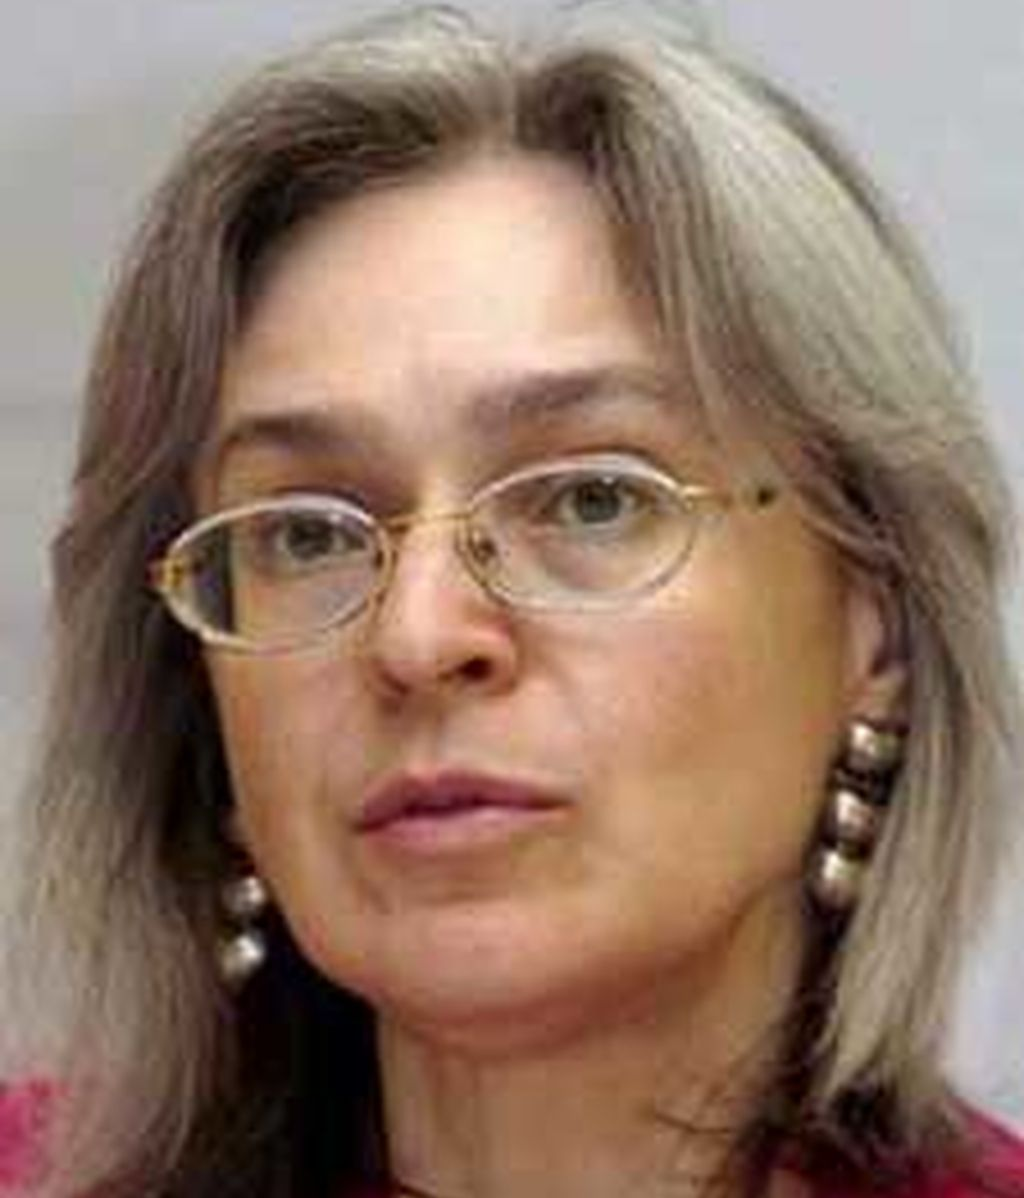 La periodista rusa asesinada, Anna Politkóvskaya. Foto: EFE